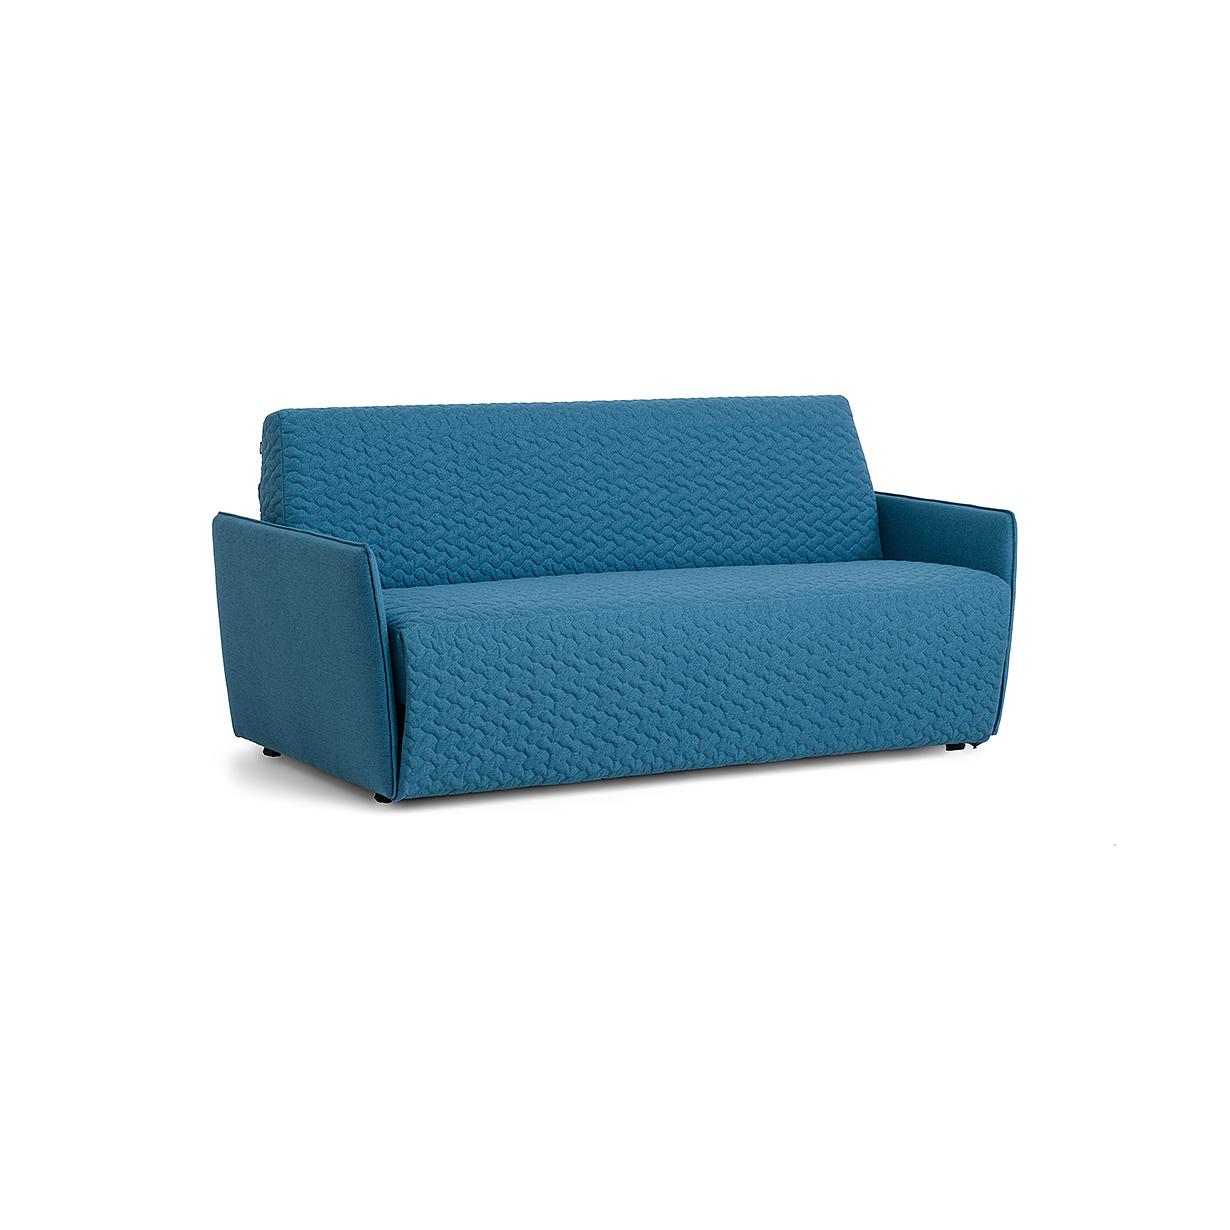 Amazing Sleep 2 Seater Sofa Bed Ibusinesslaw Wood Chair Design Ideas Ibusinesslaworg